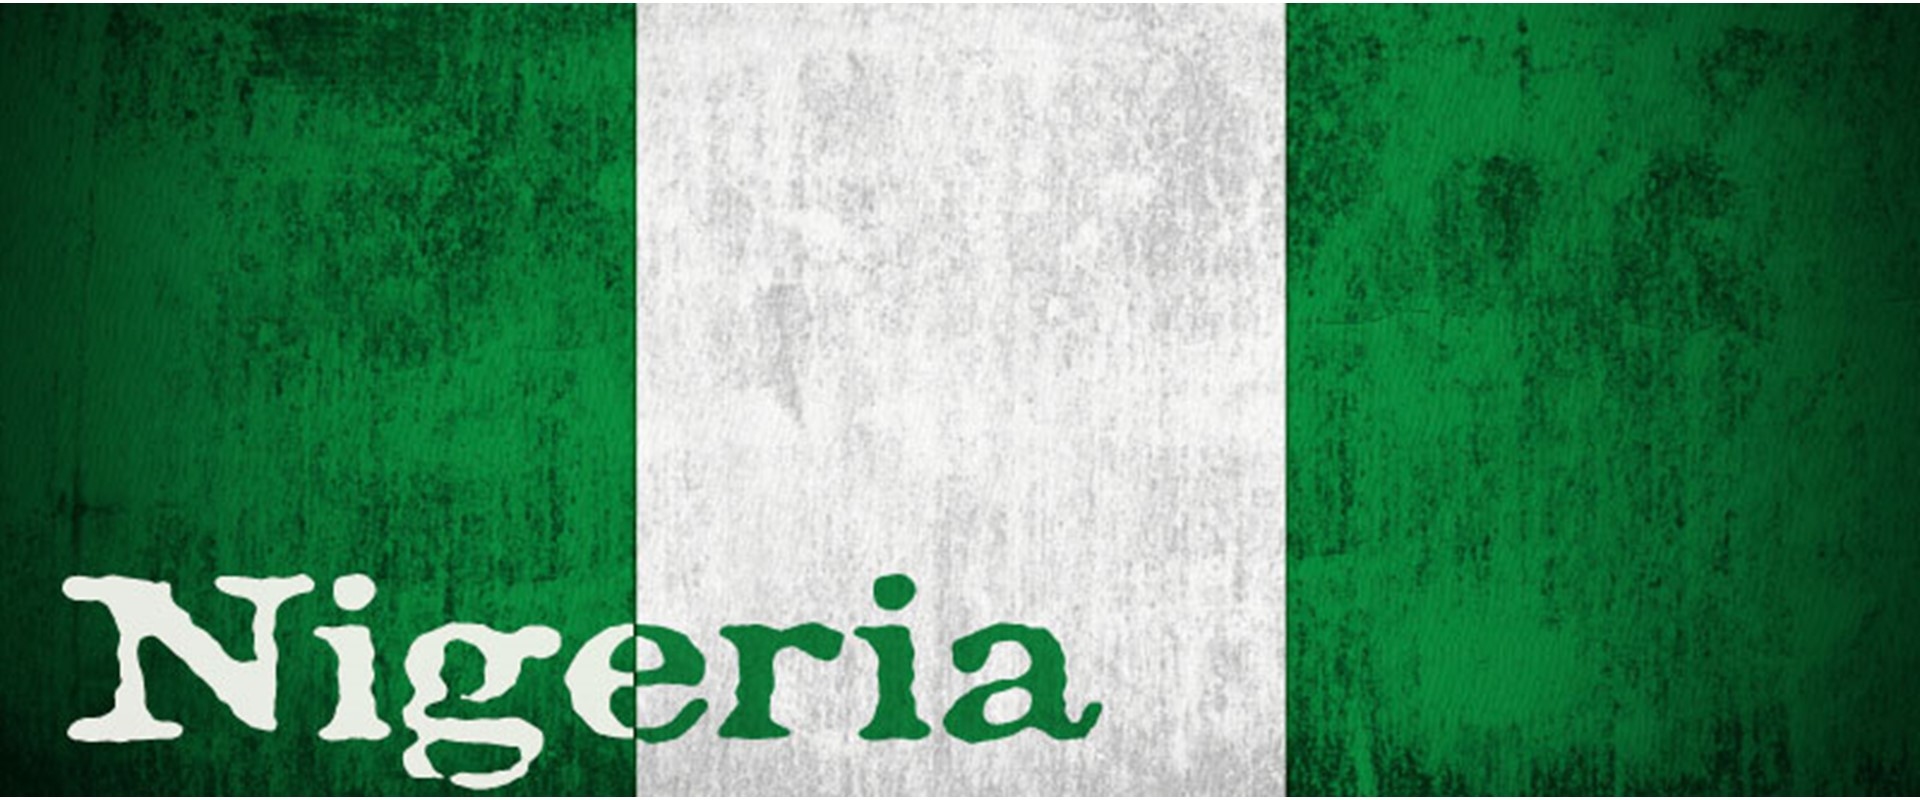 Unrest in northern nigeria for Home wallpaper nigeria